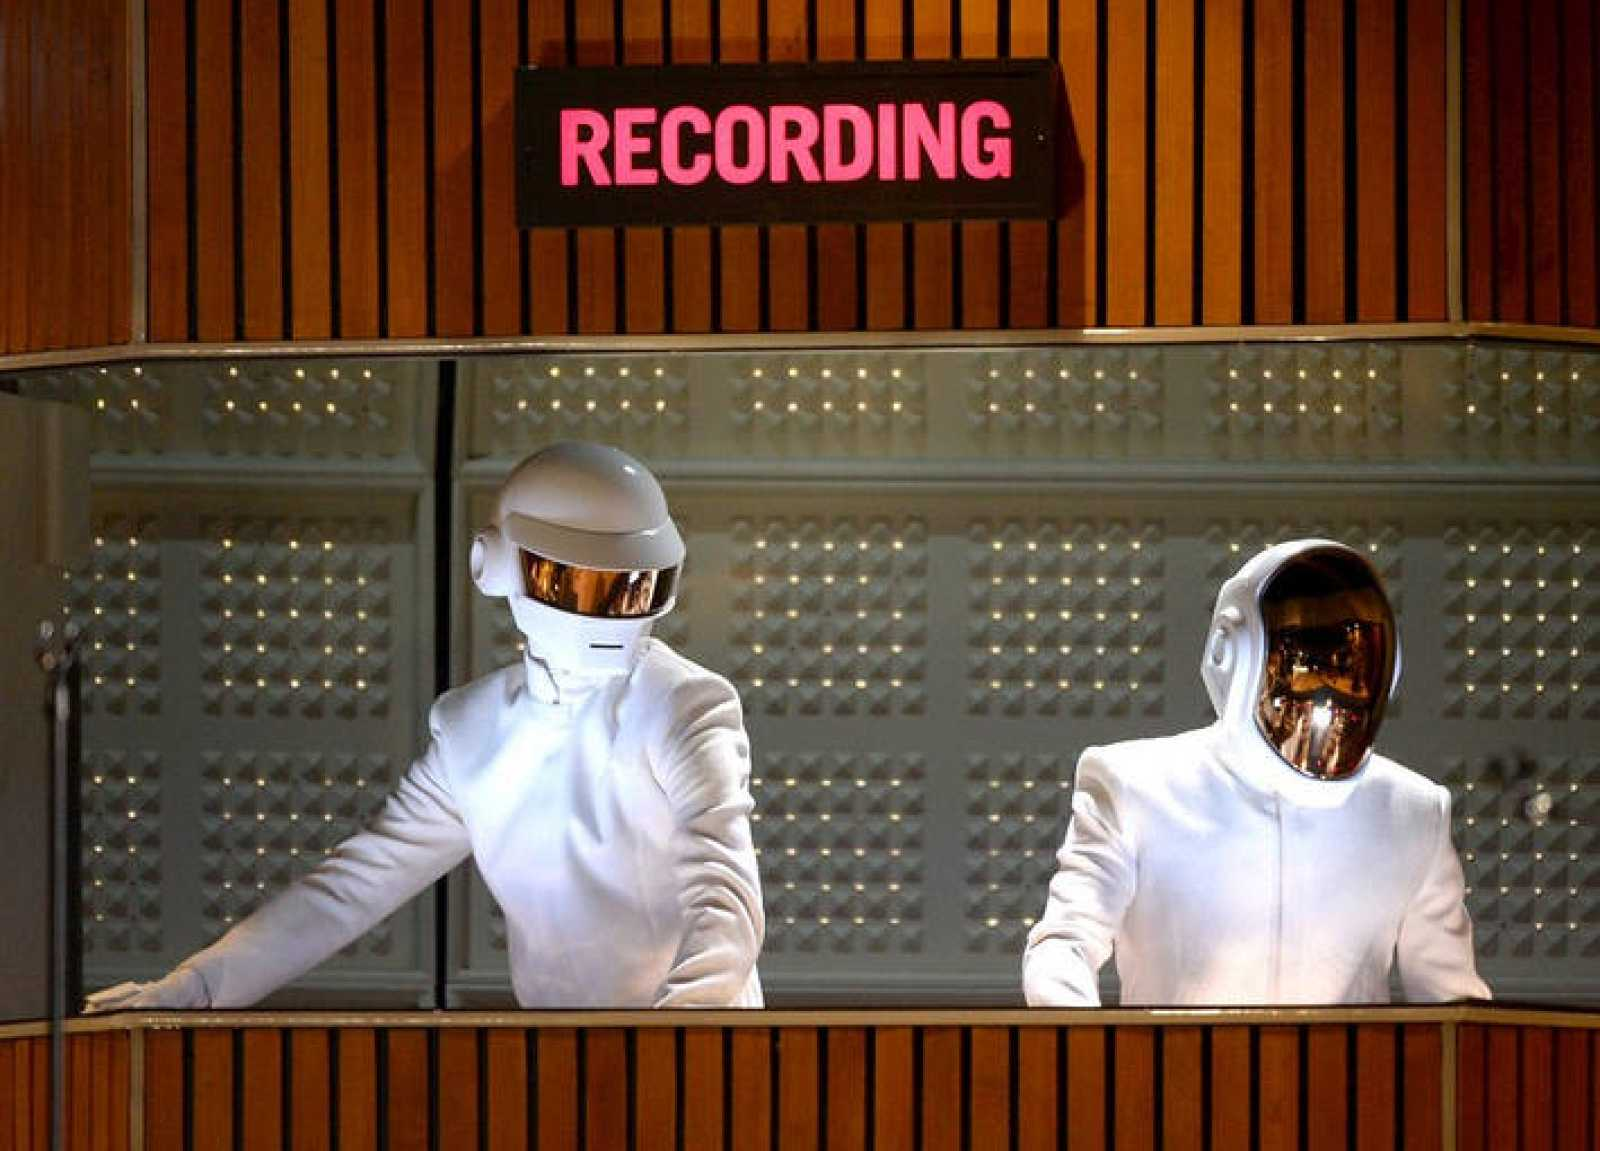 Daft Punk en los Grammys 2014